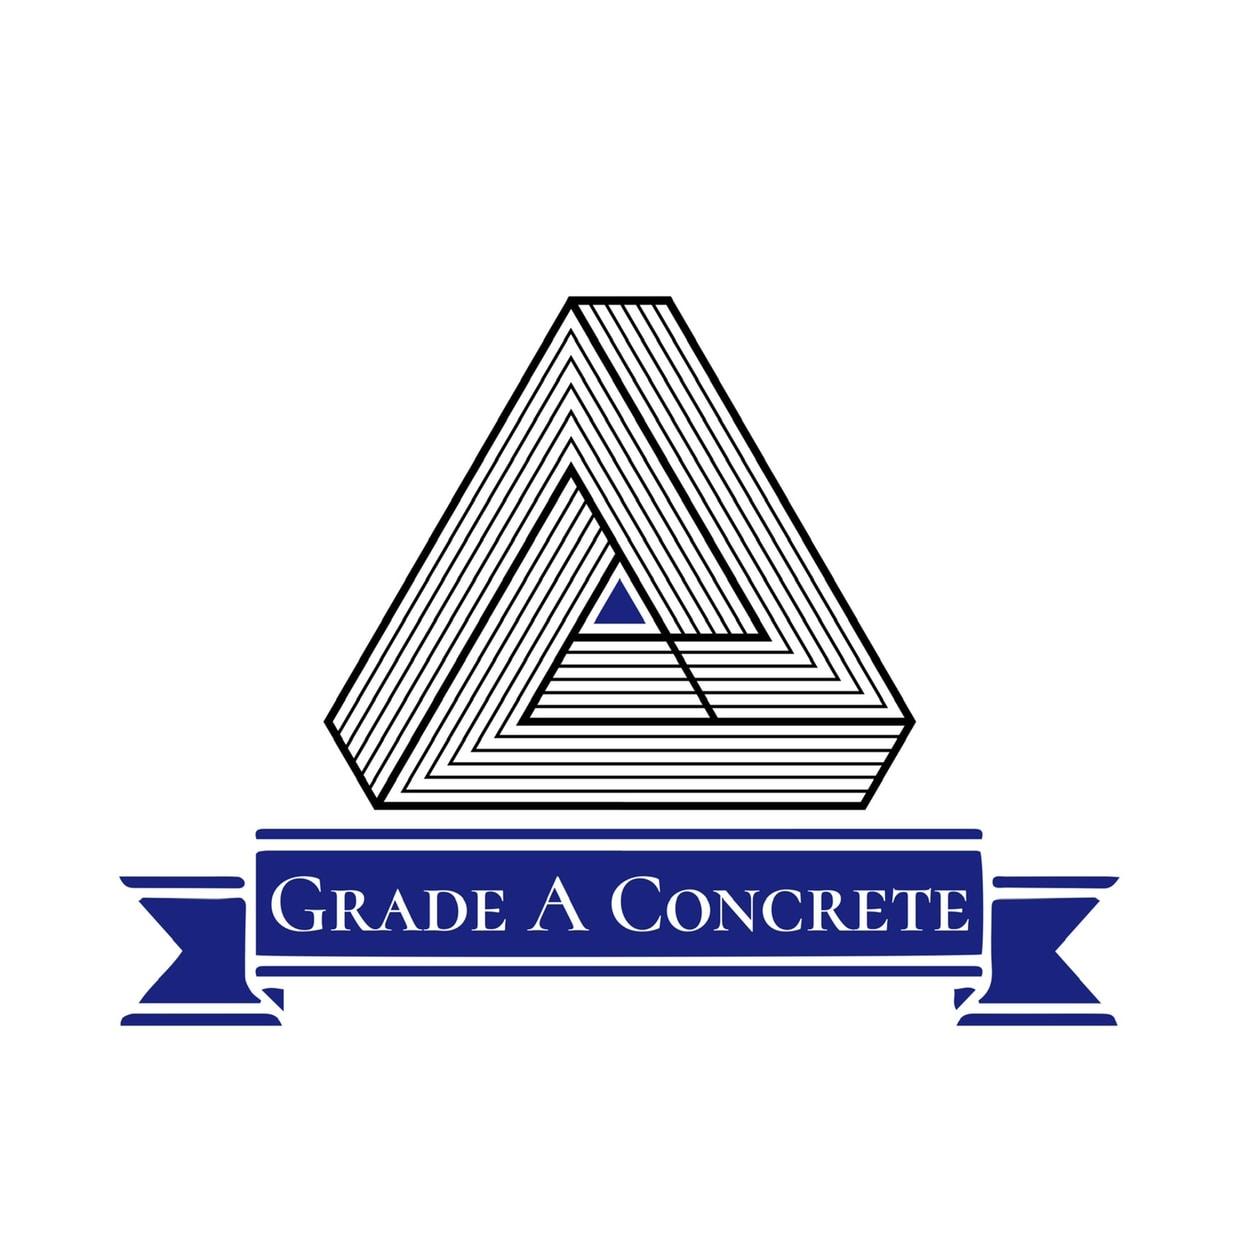 Grade A Concrete